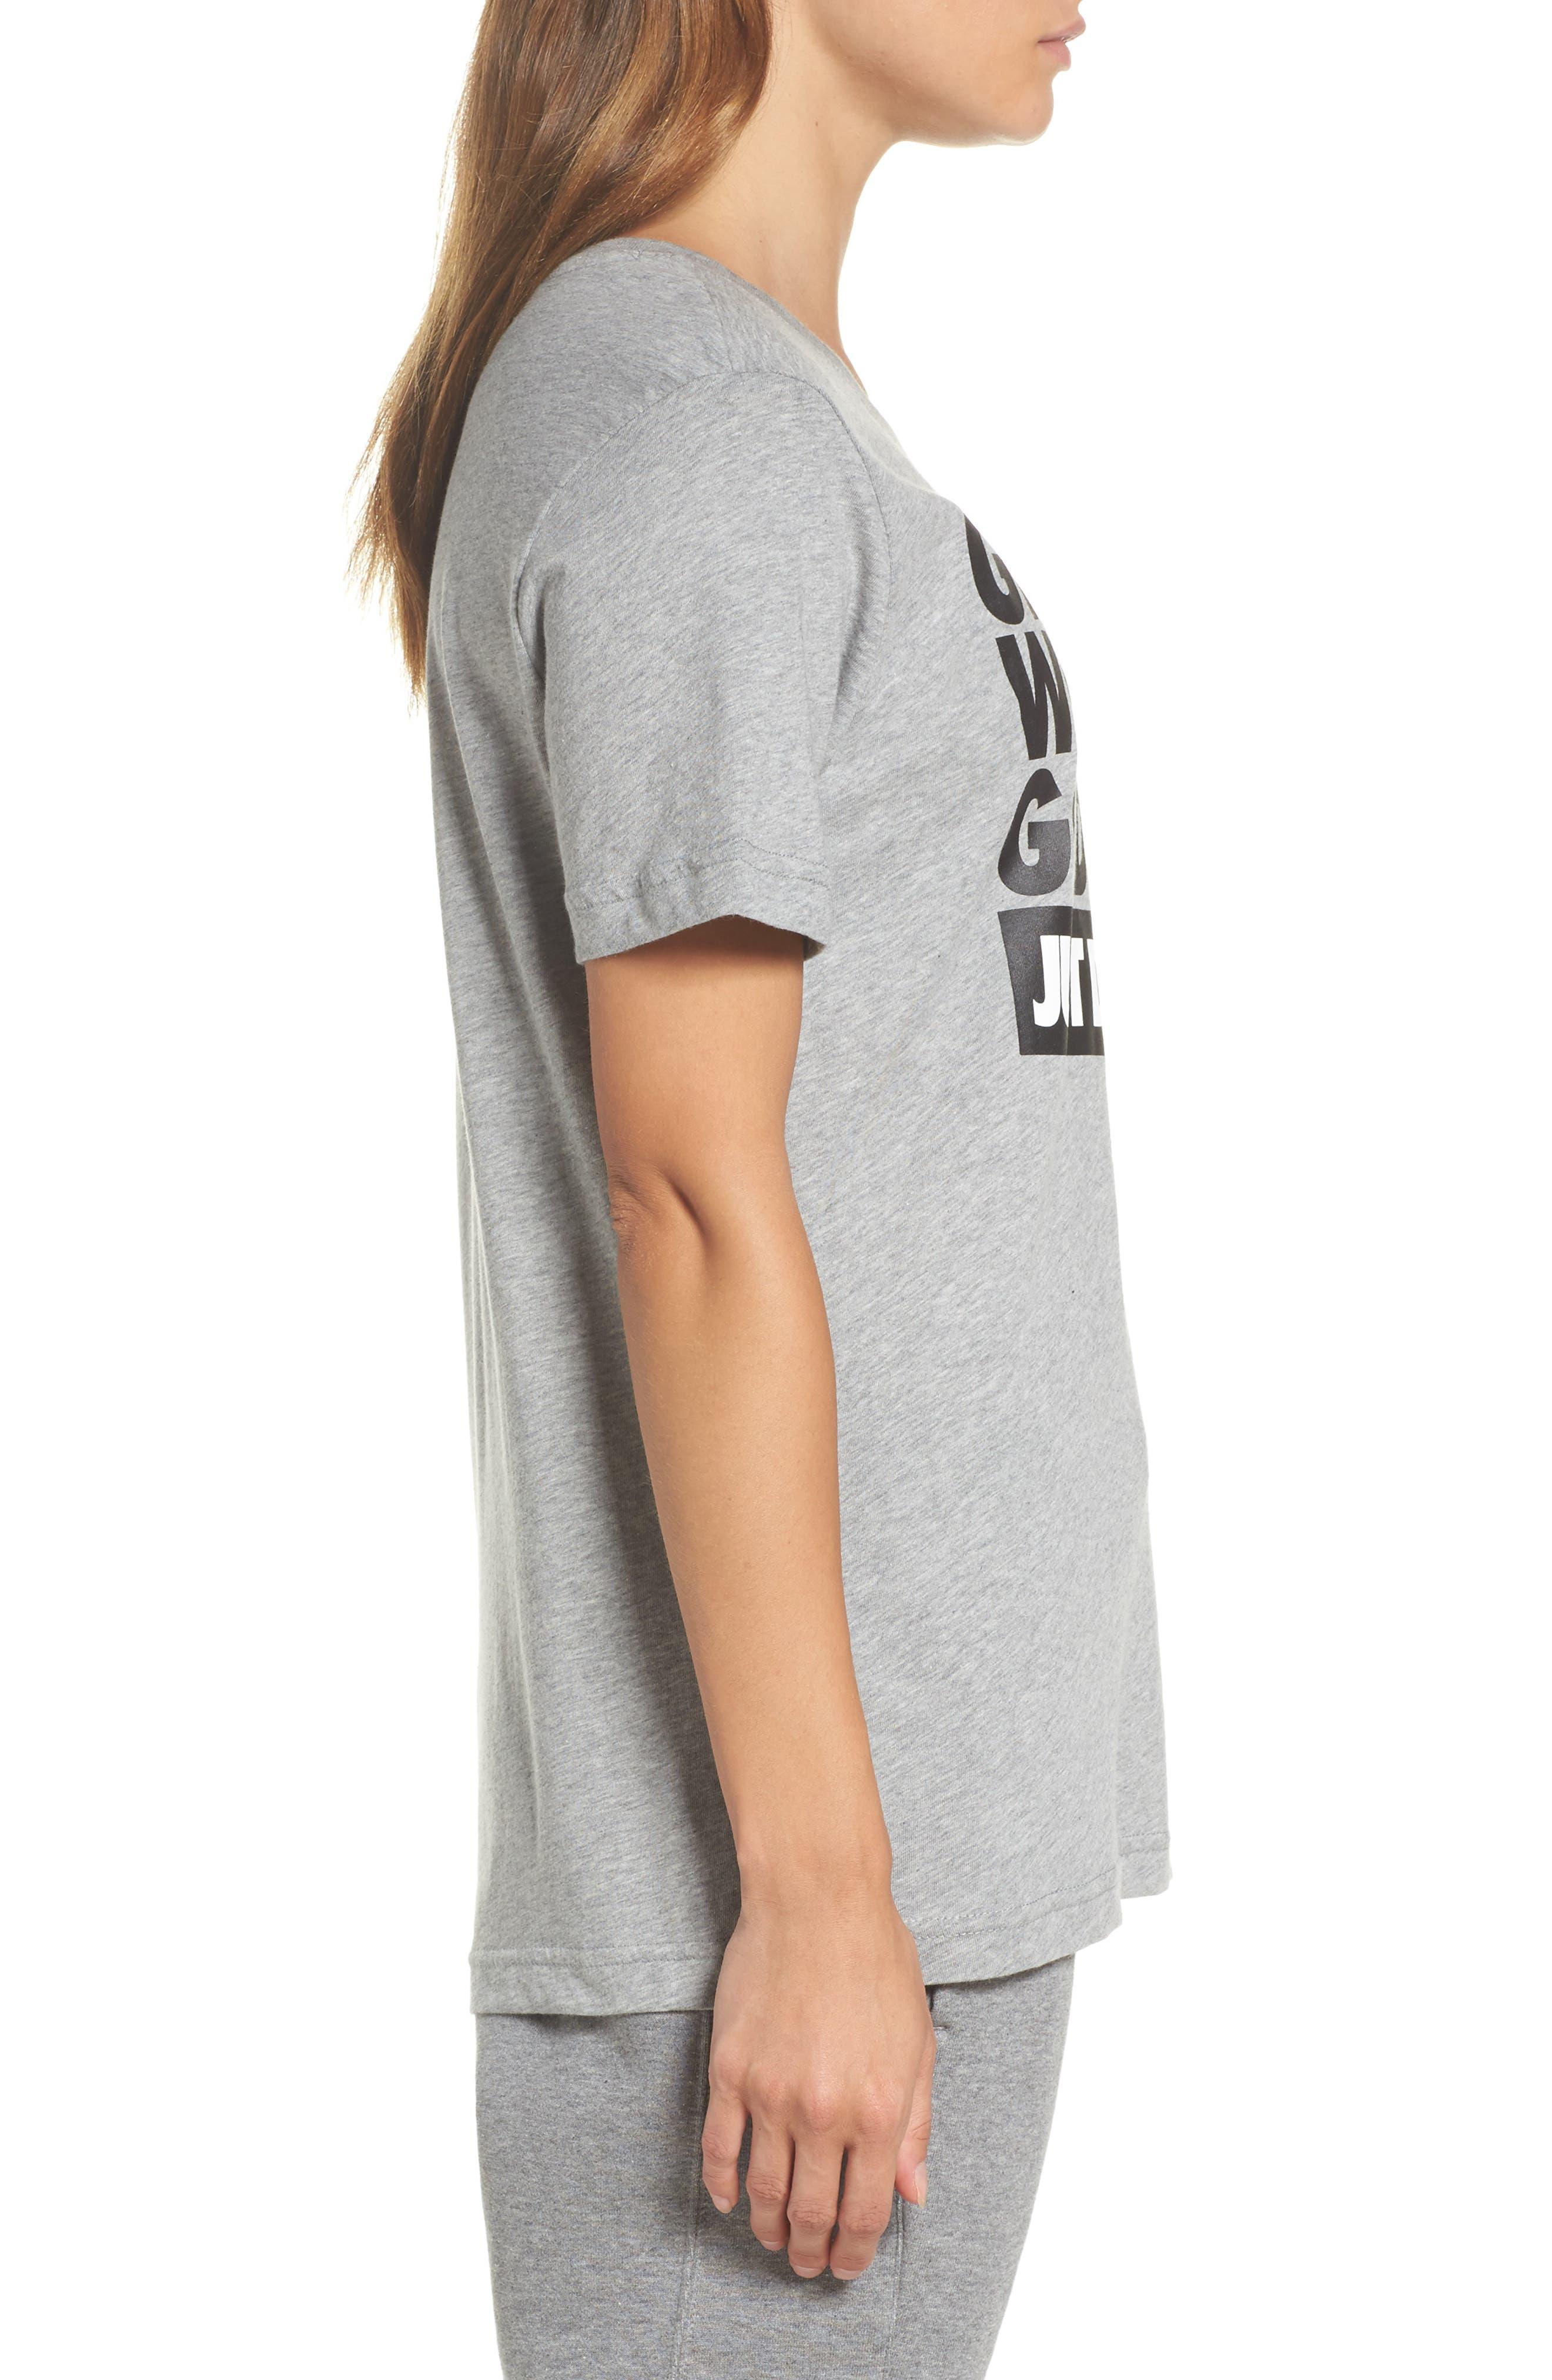 Sportswear Goddess Graphic Tee,                             Alternate thumbnail 3, color,                             Dark Grey Heather/ Black